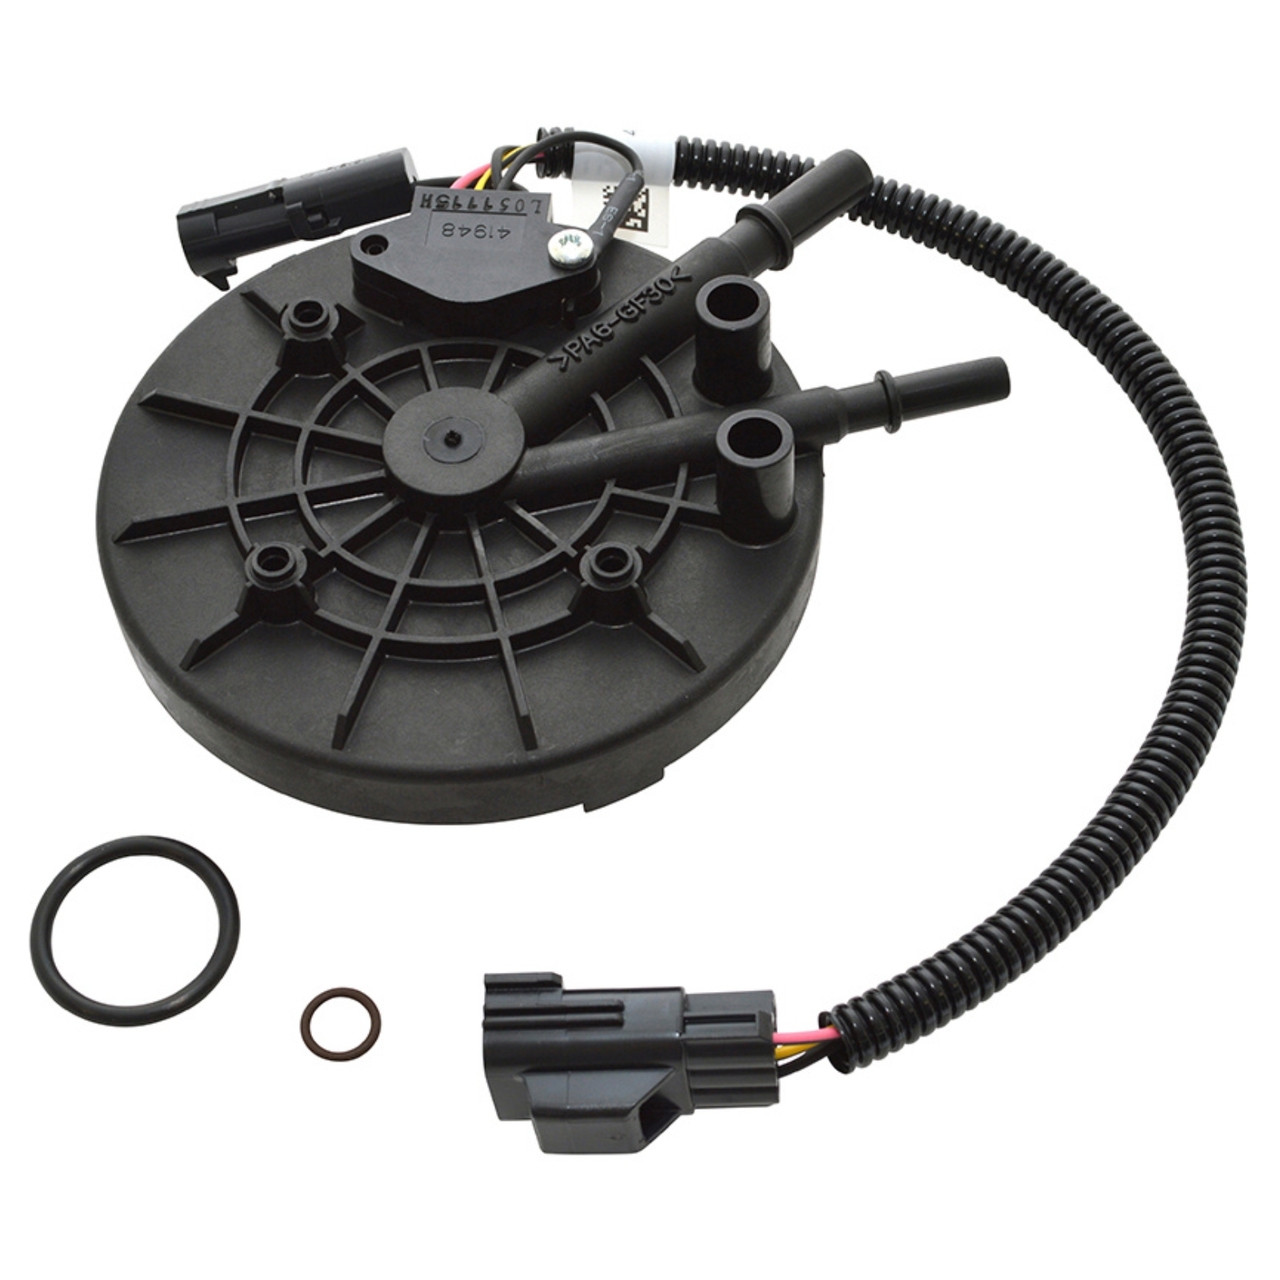 land rover discovery 3 4 fuel filter housing water sensor repair kit [ 1280 x 1280 Pixel ]